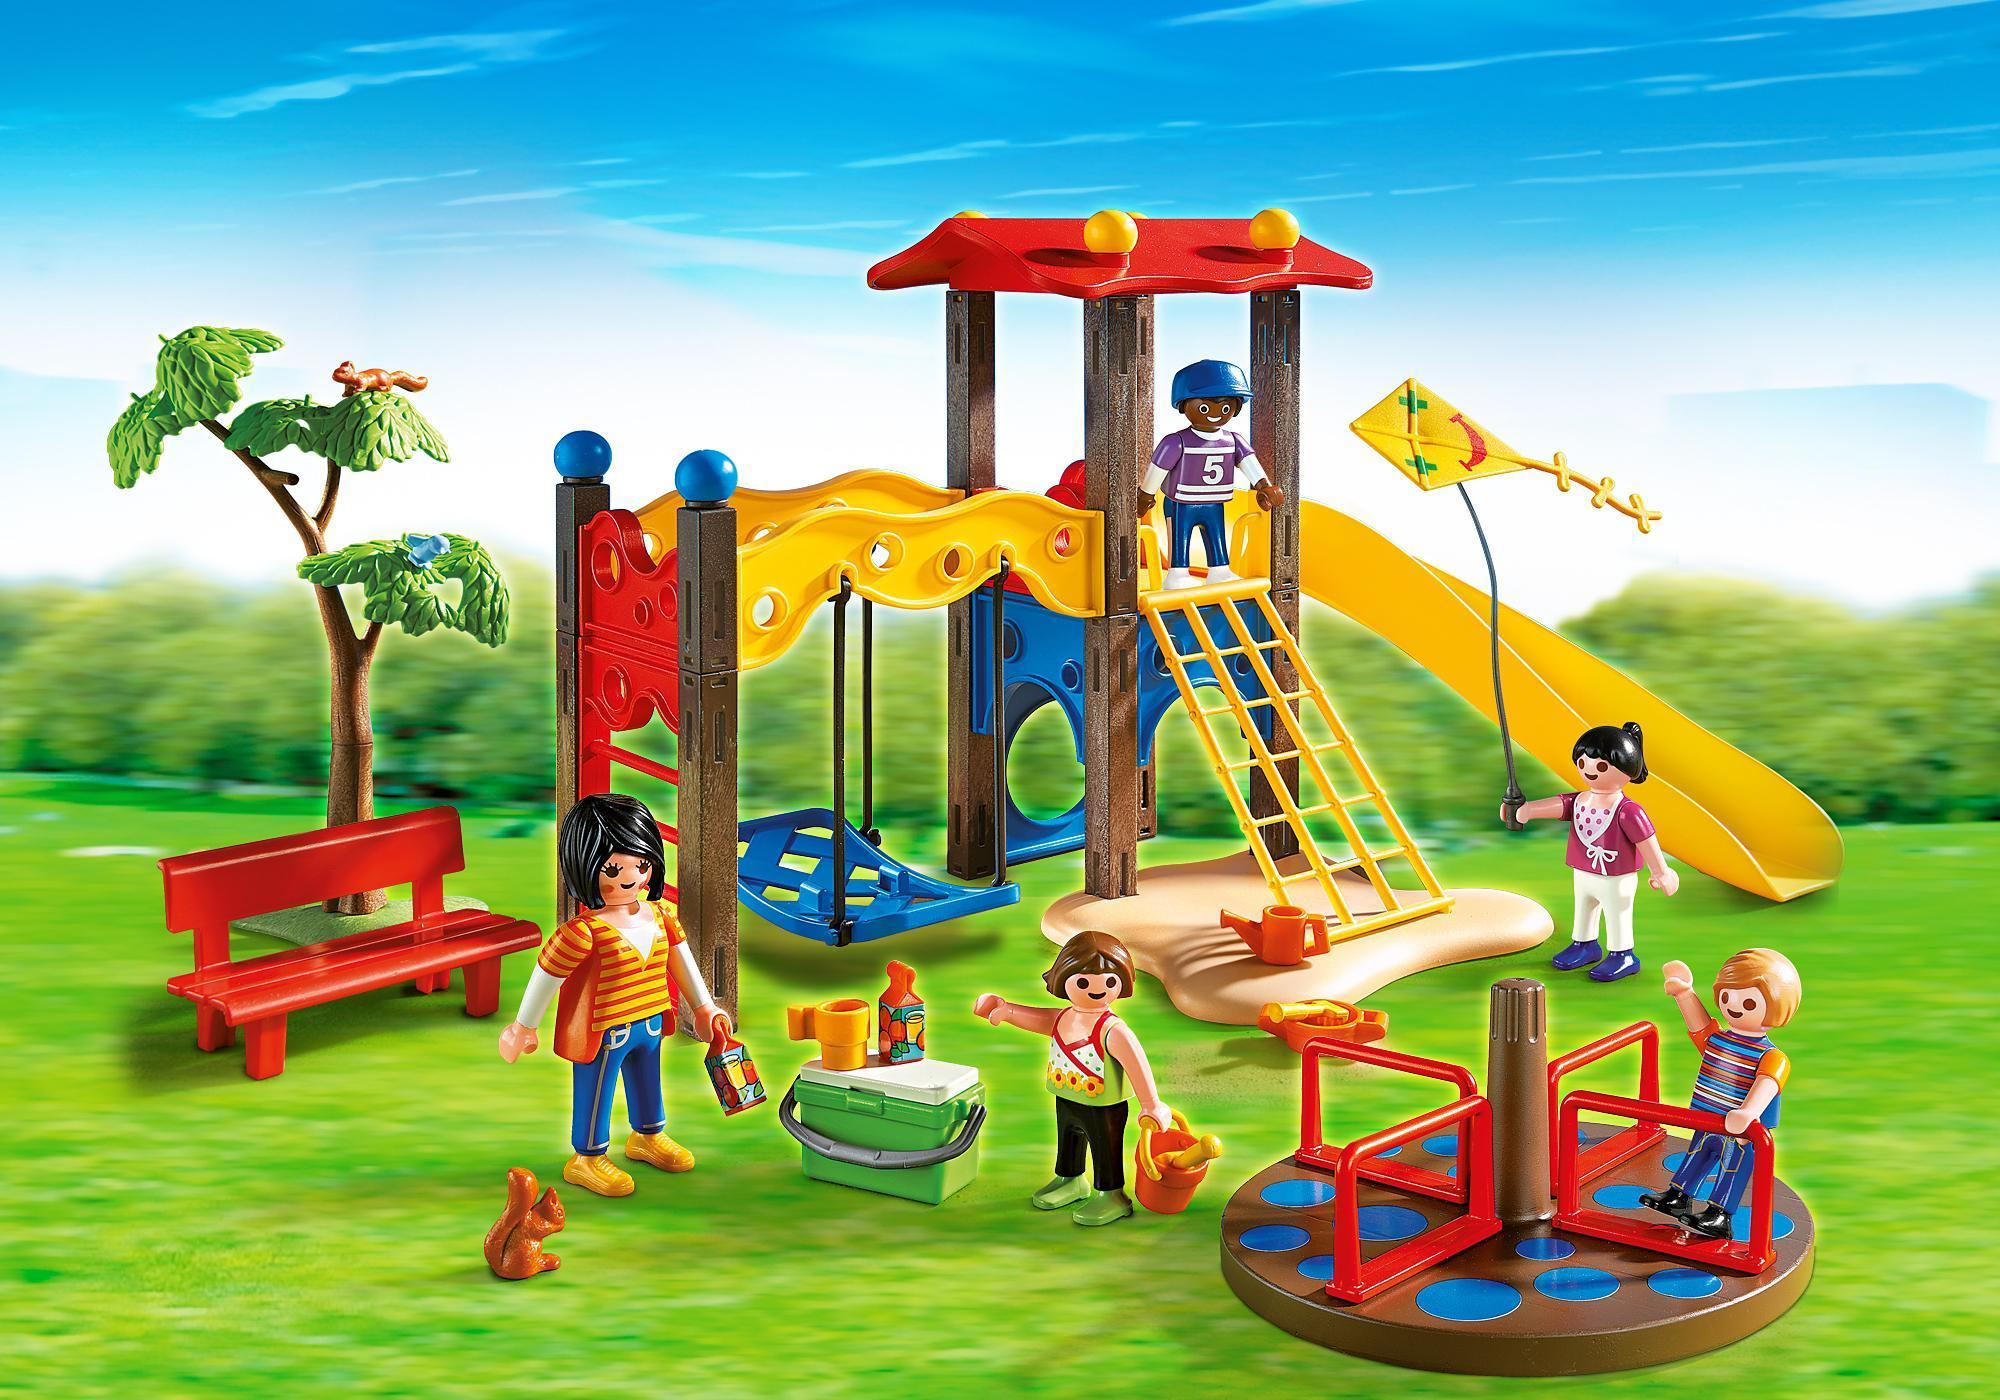 Playground 5612 Playmobil 174 Canada